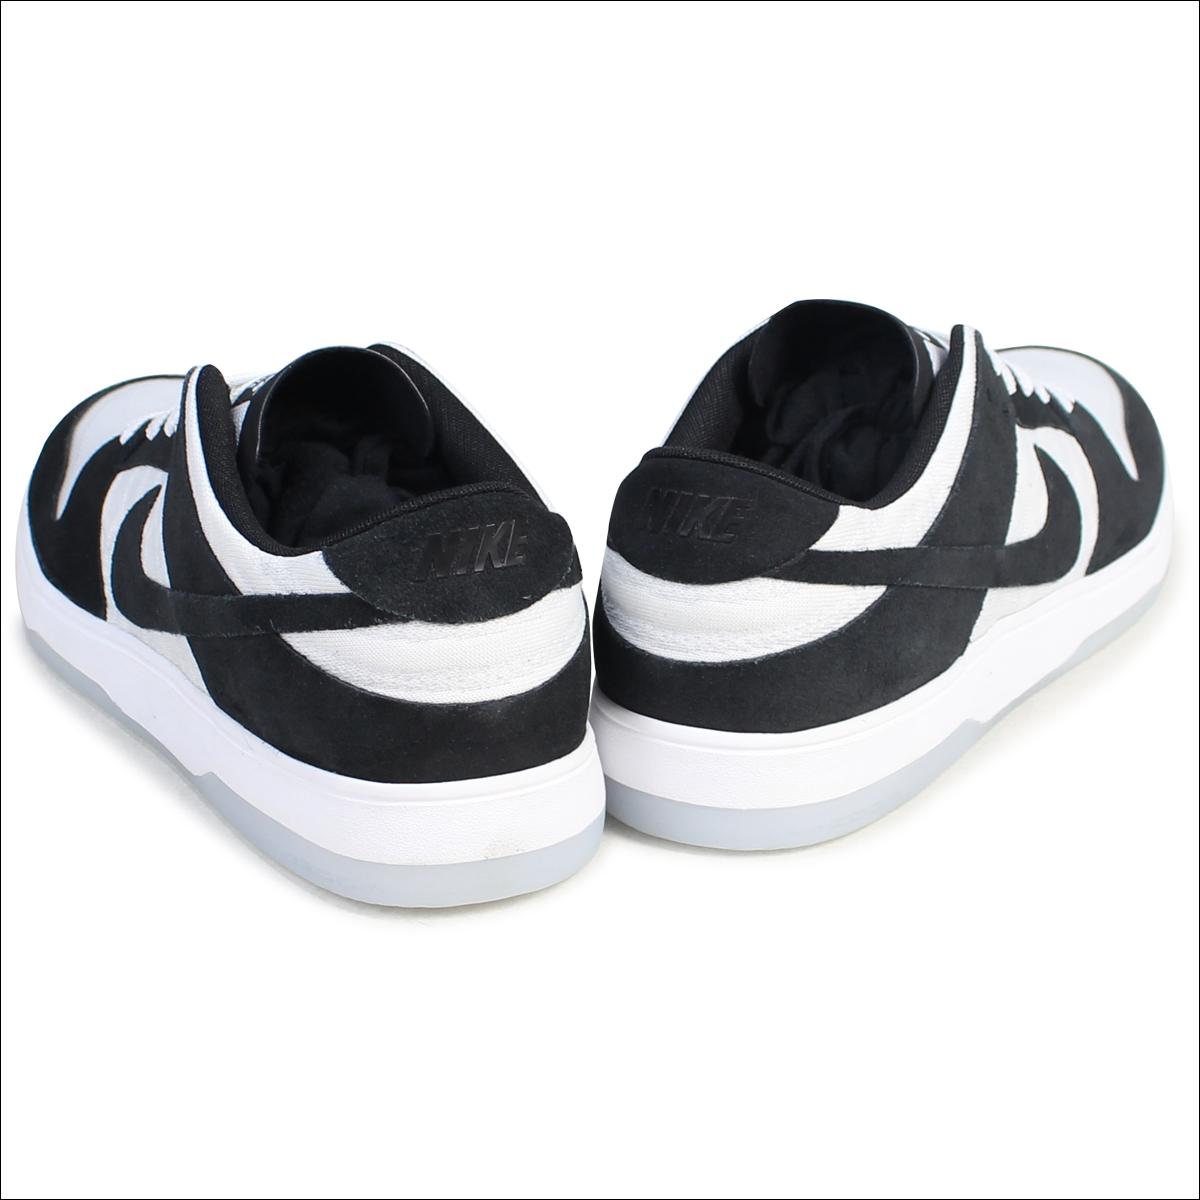 half off d37da 81b45 NIKE Nike SB dunk low sneakers ZOOM DUNK LOW ELITE QS OSKI 877,063-001  men's shoes black black